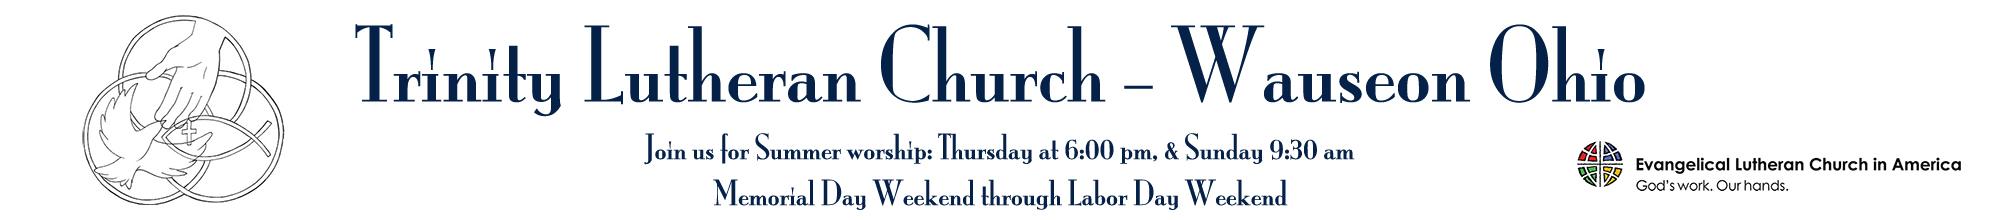 Trinity Lutheran Church – Wauseon Ohio